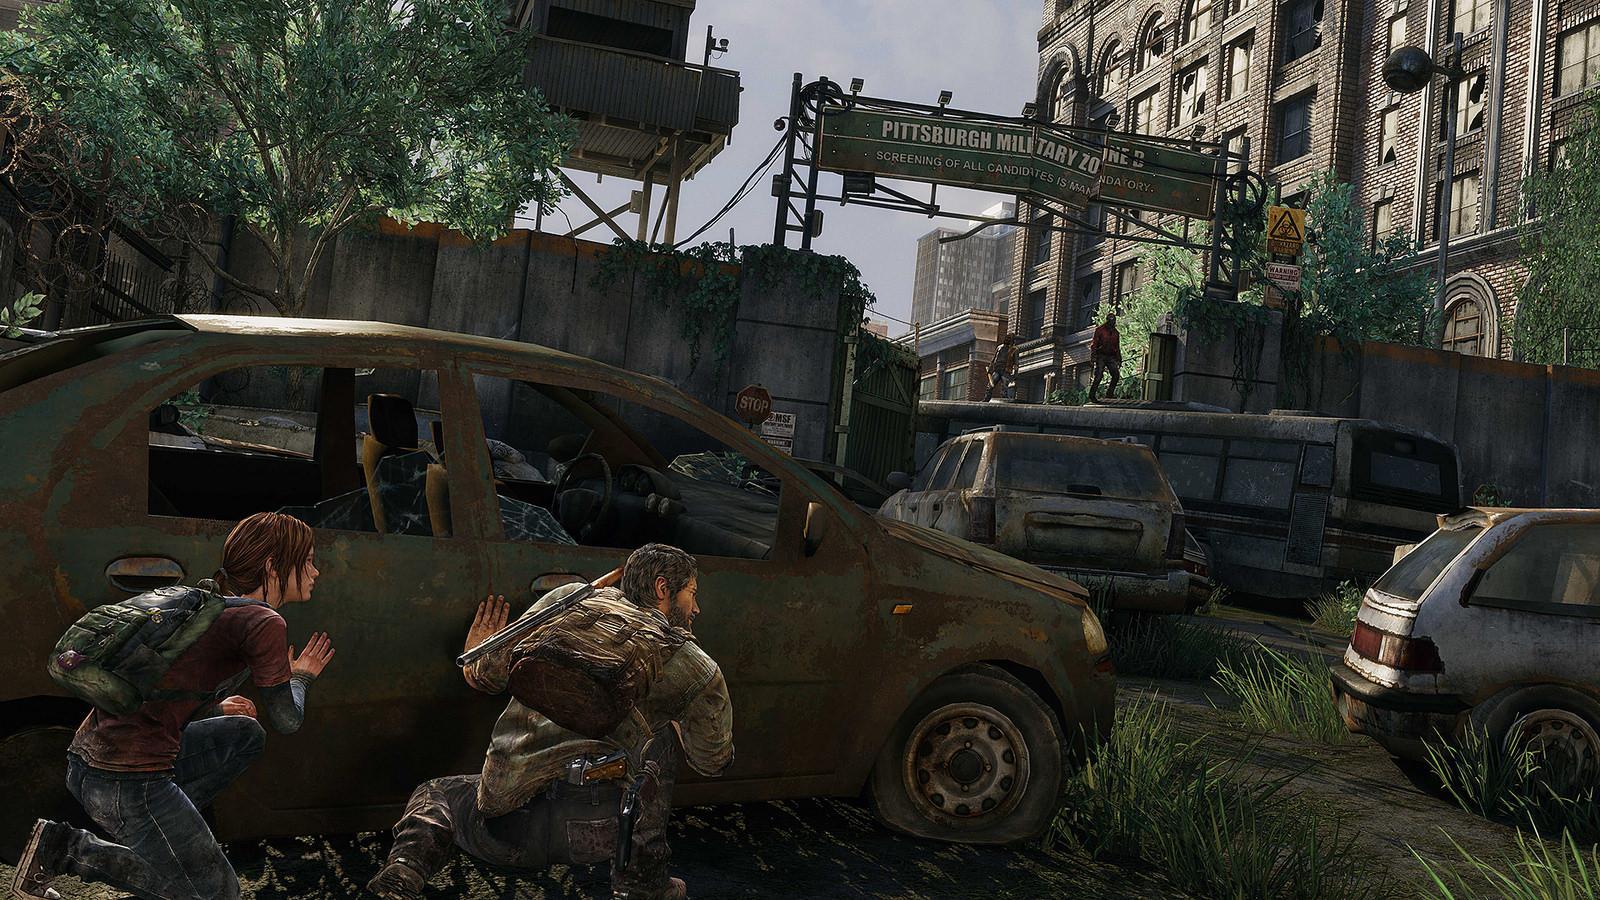 Публикация с тегами: Обои, HD, Игры, The Last of Us: part 2, Гейминг